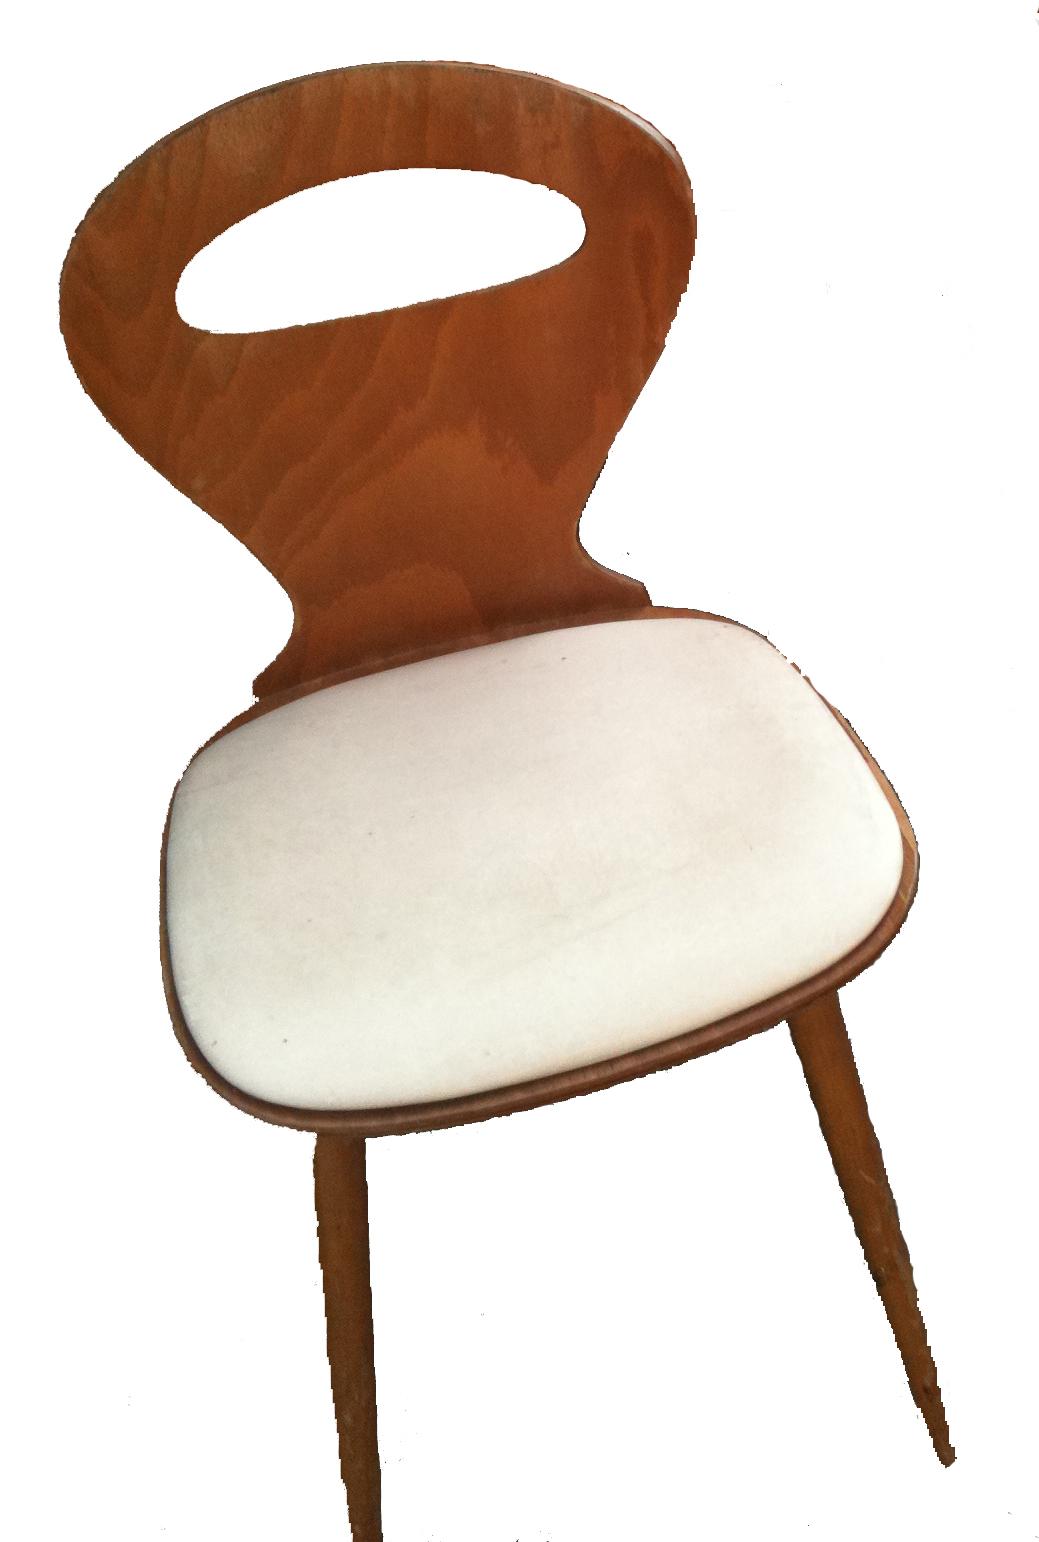 bo vintage chaise bistro fourmi de baumann assise en ska ann es 60. Black Bedroom Furniture Sets. Home Design Ideas